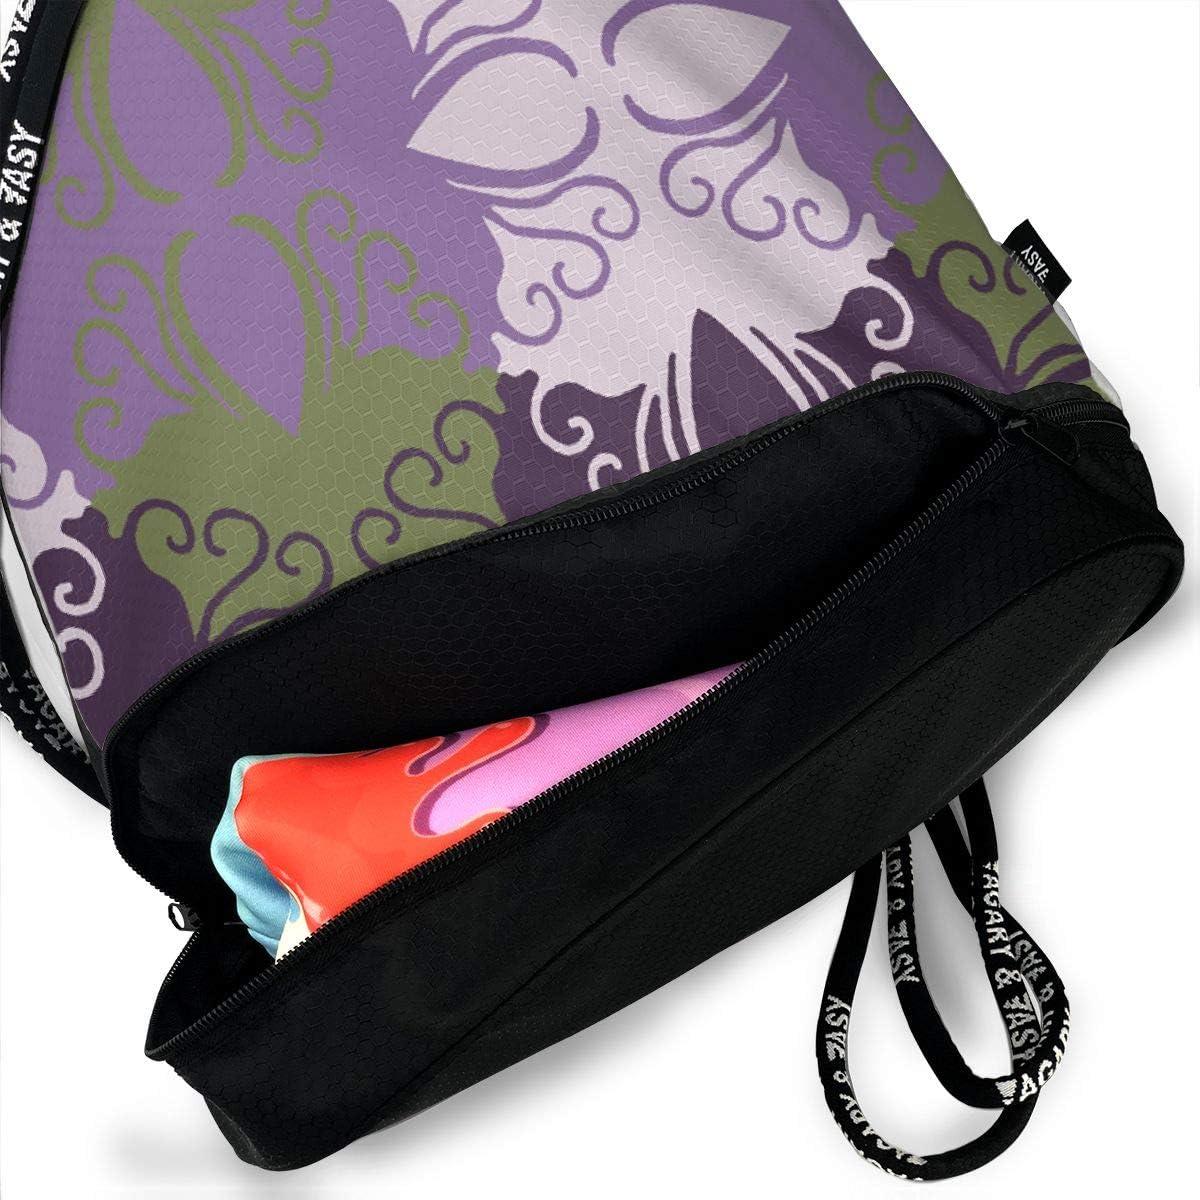 Purple Cutwork Drawstring Backpack Sports Athletic Gym Cinch Sack String Storage Bags for Hiking Travel Beach